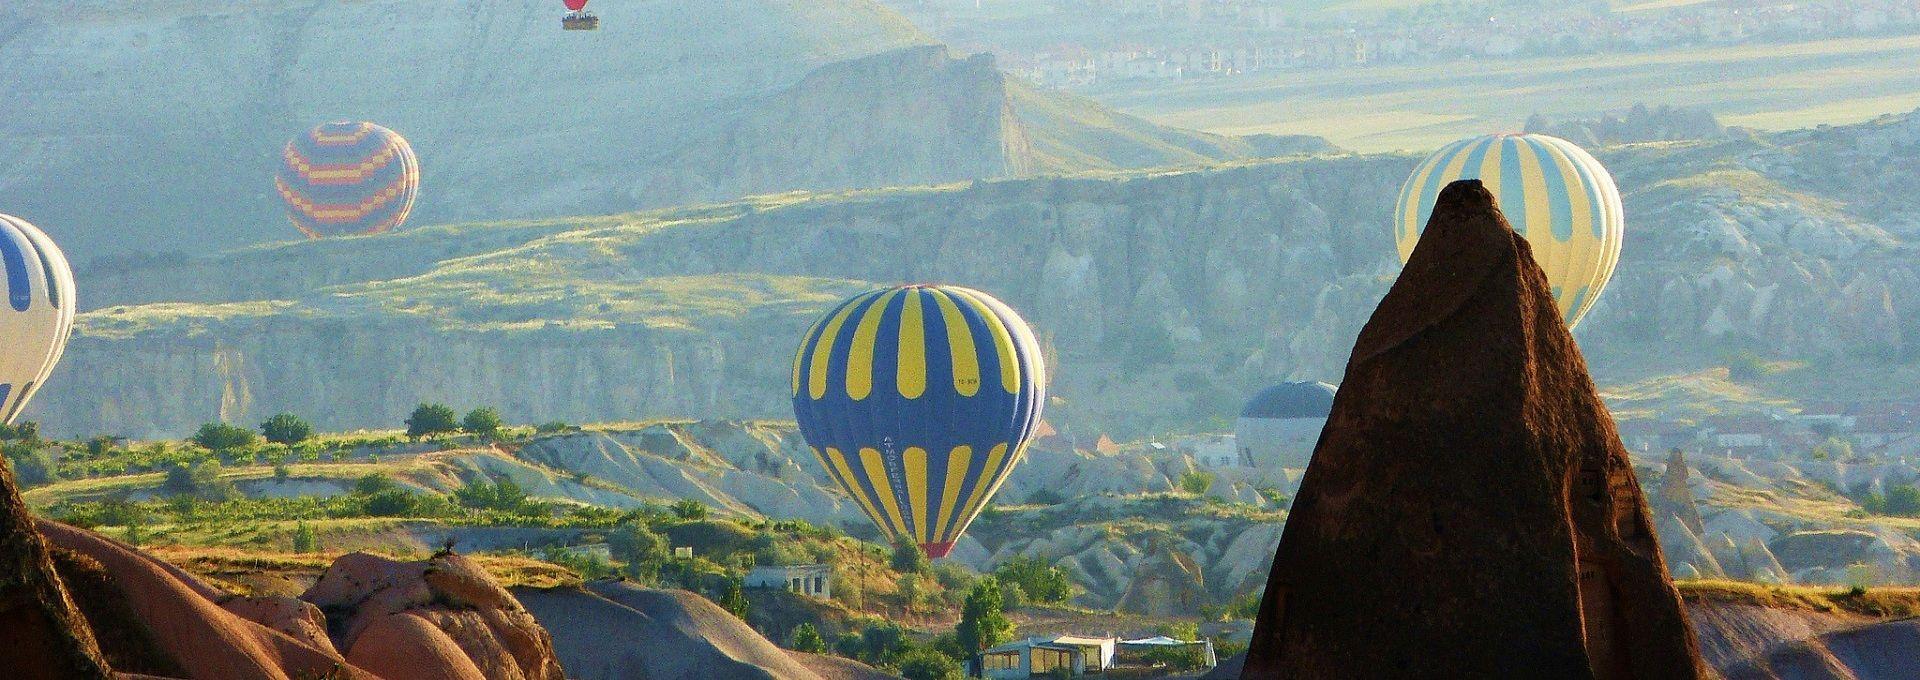 Vi Holiday Turizm & Seyahat Acentası